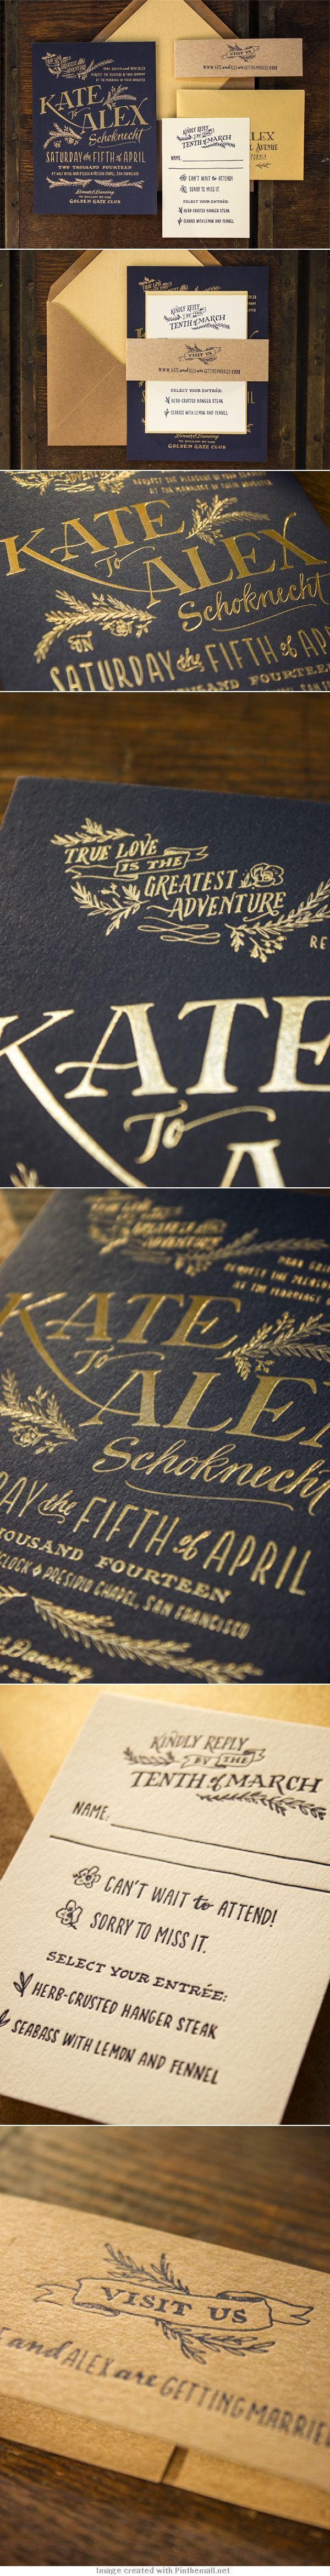 Kate + Alex's Elegant Rustic Wedding Invitations  #letterpress  #typography     http://ohsobeautifulpaper.com/2014/04/kate-alexs-elegant-rustic-wedding-invitations/ #weddinginvitation